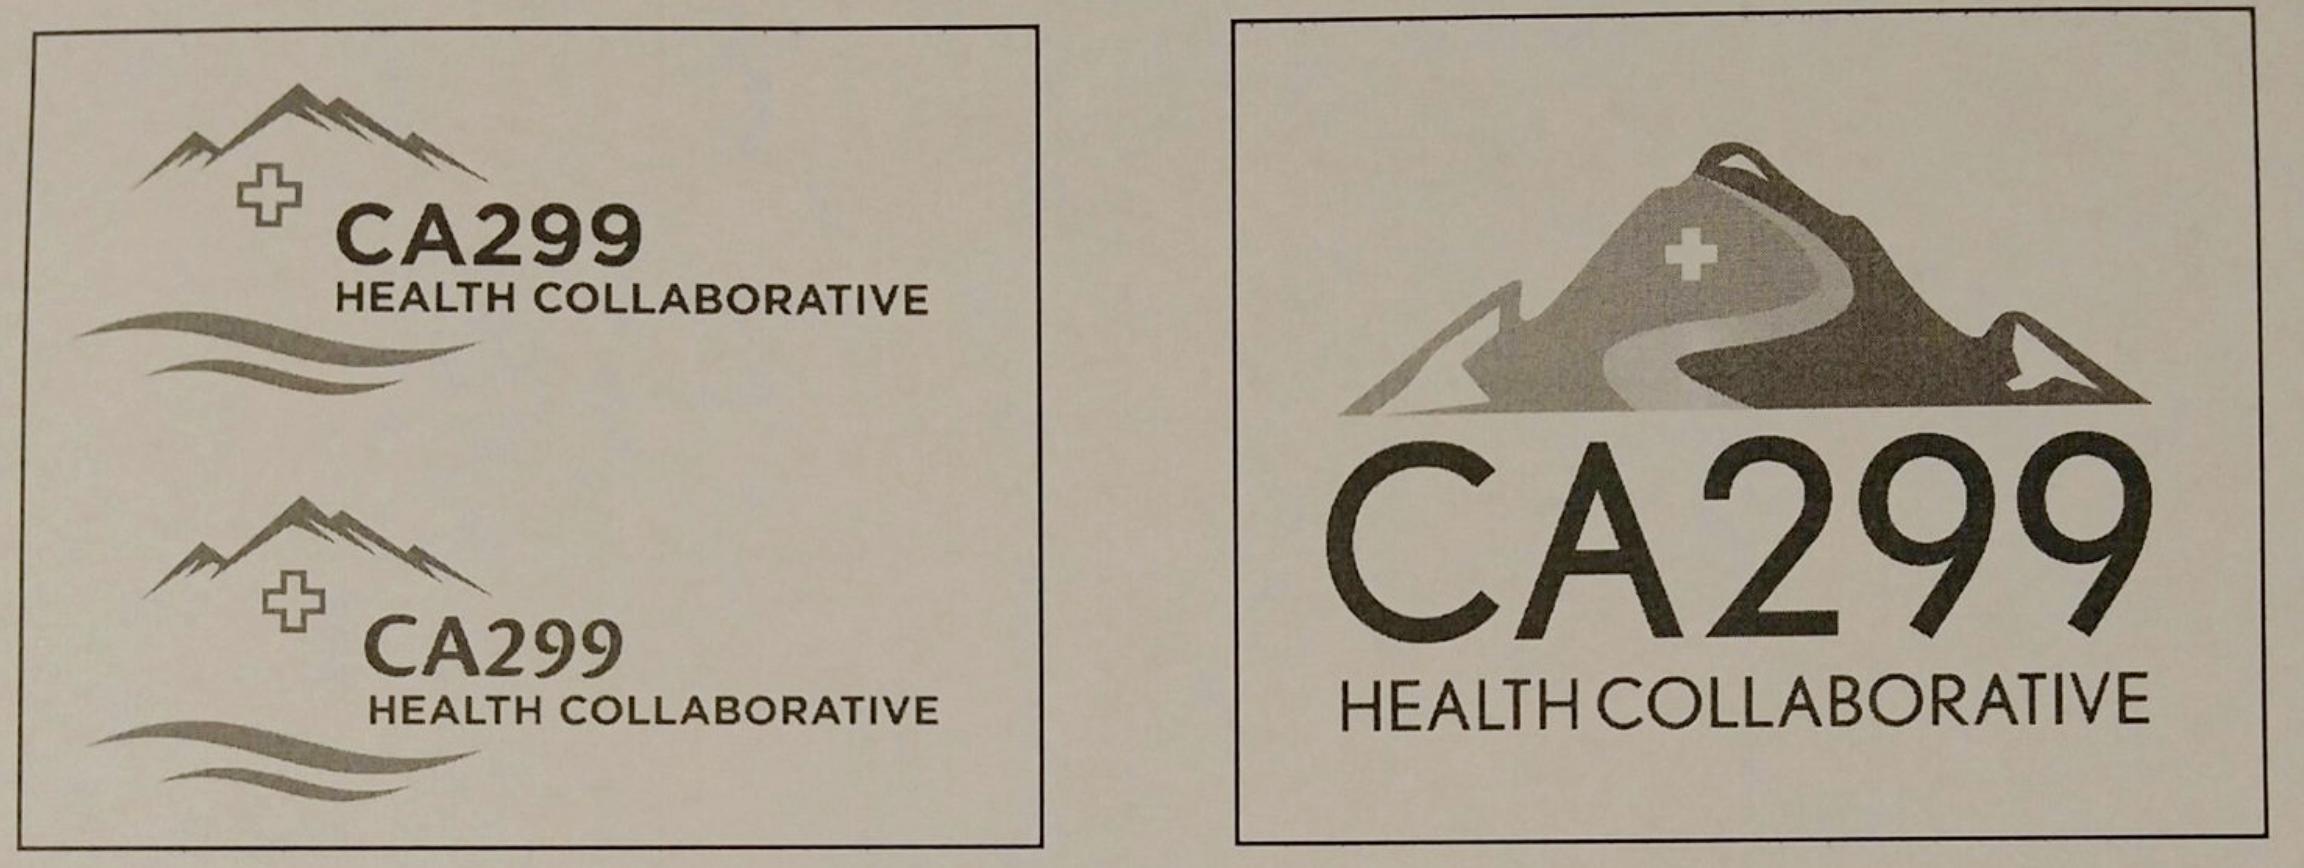 CA 299 Health Collaborative | Redding Health Expo, Redding CA Health and Wellness Show